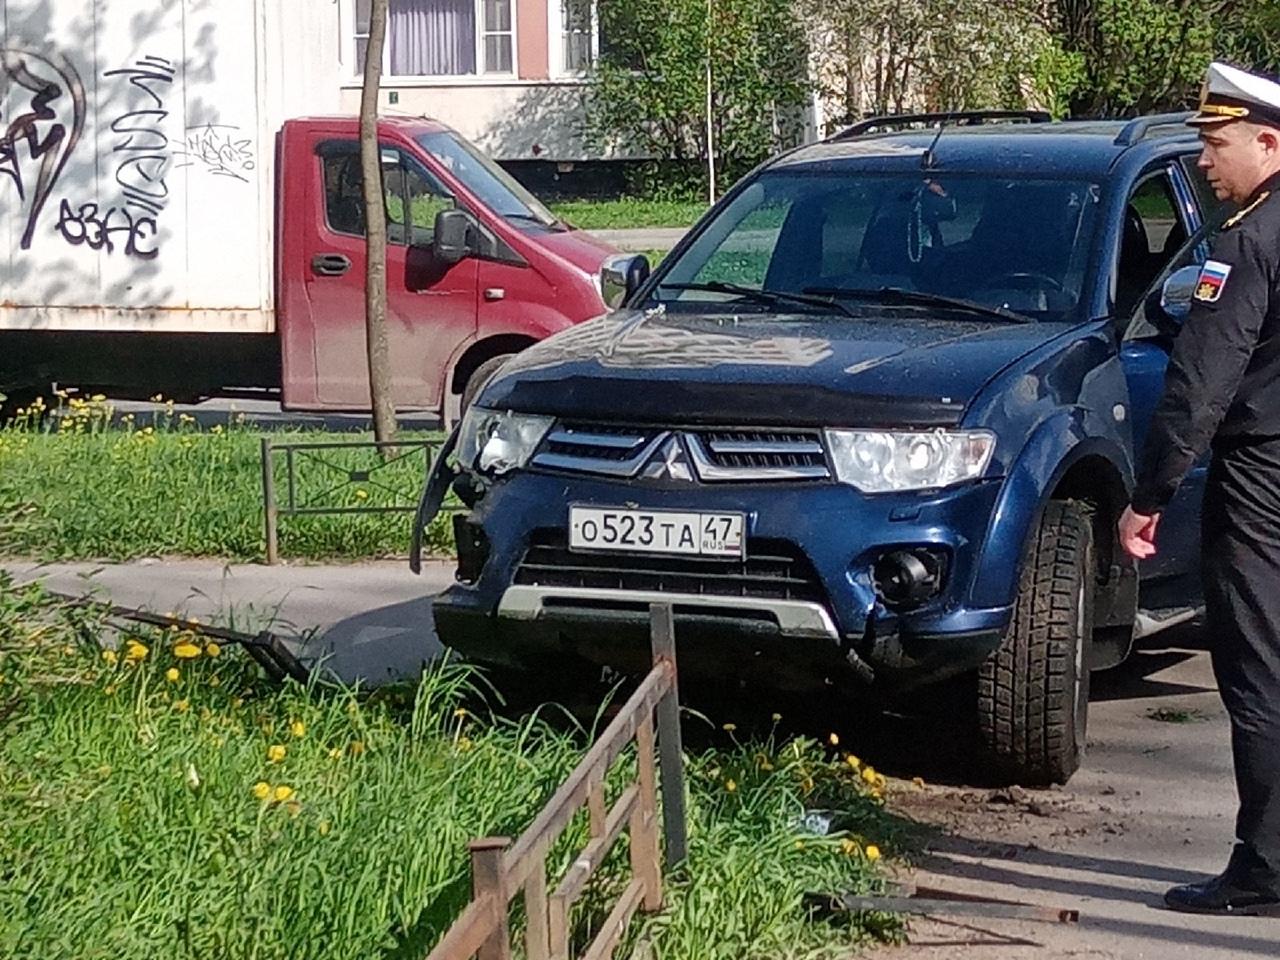 Дама за рулем внедорожника «Мицубиси Паджеро Спорт» избороздила газон и повалила цветущую вишню на у...